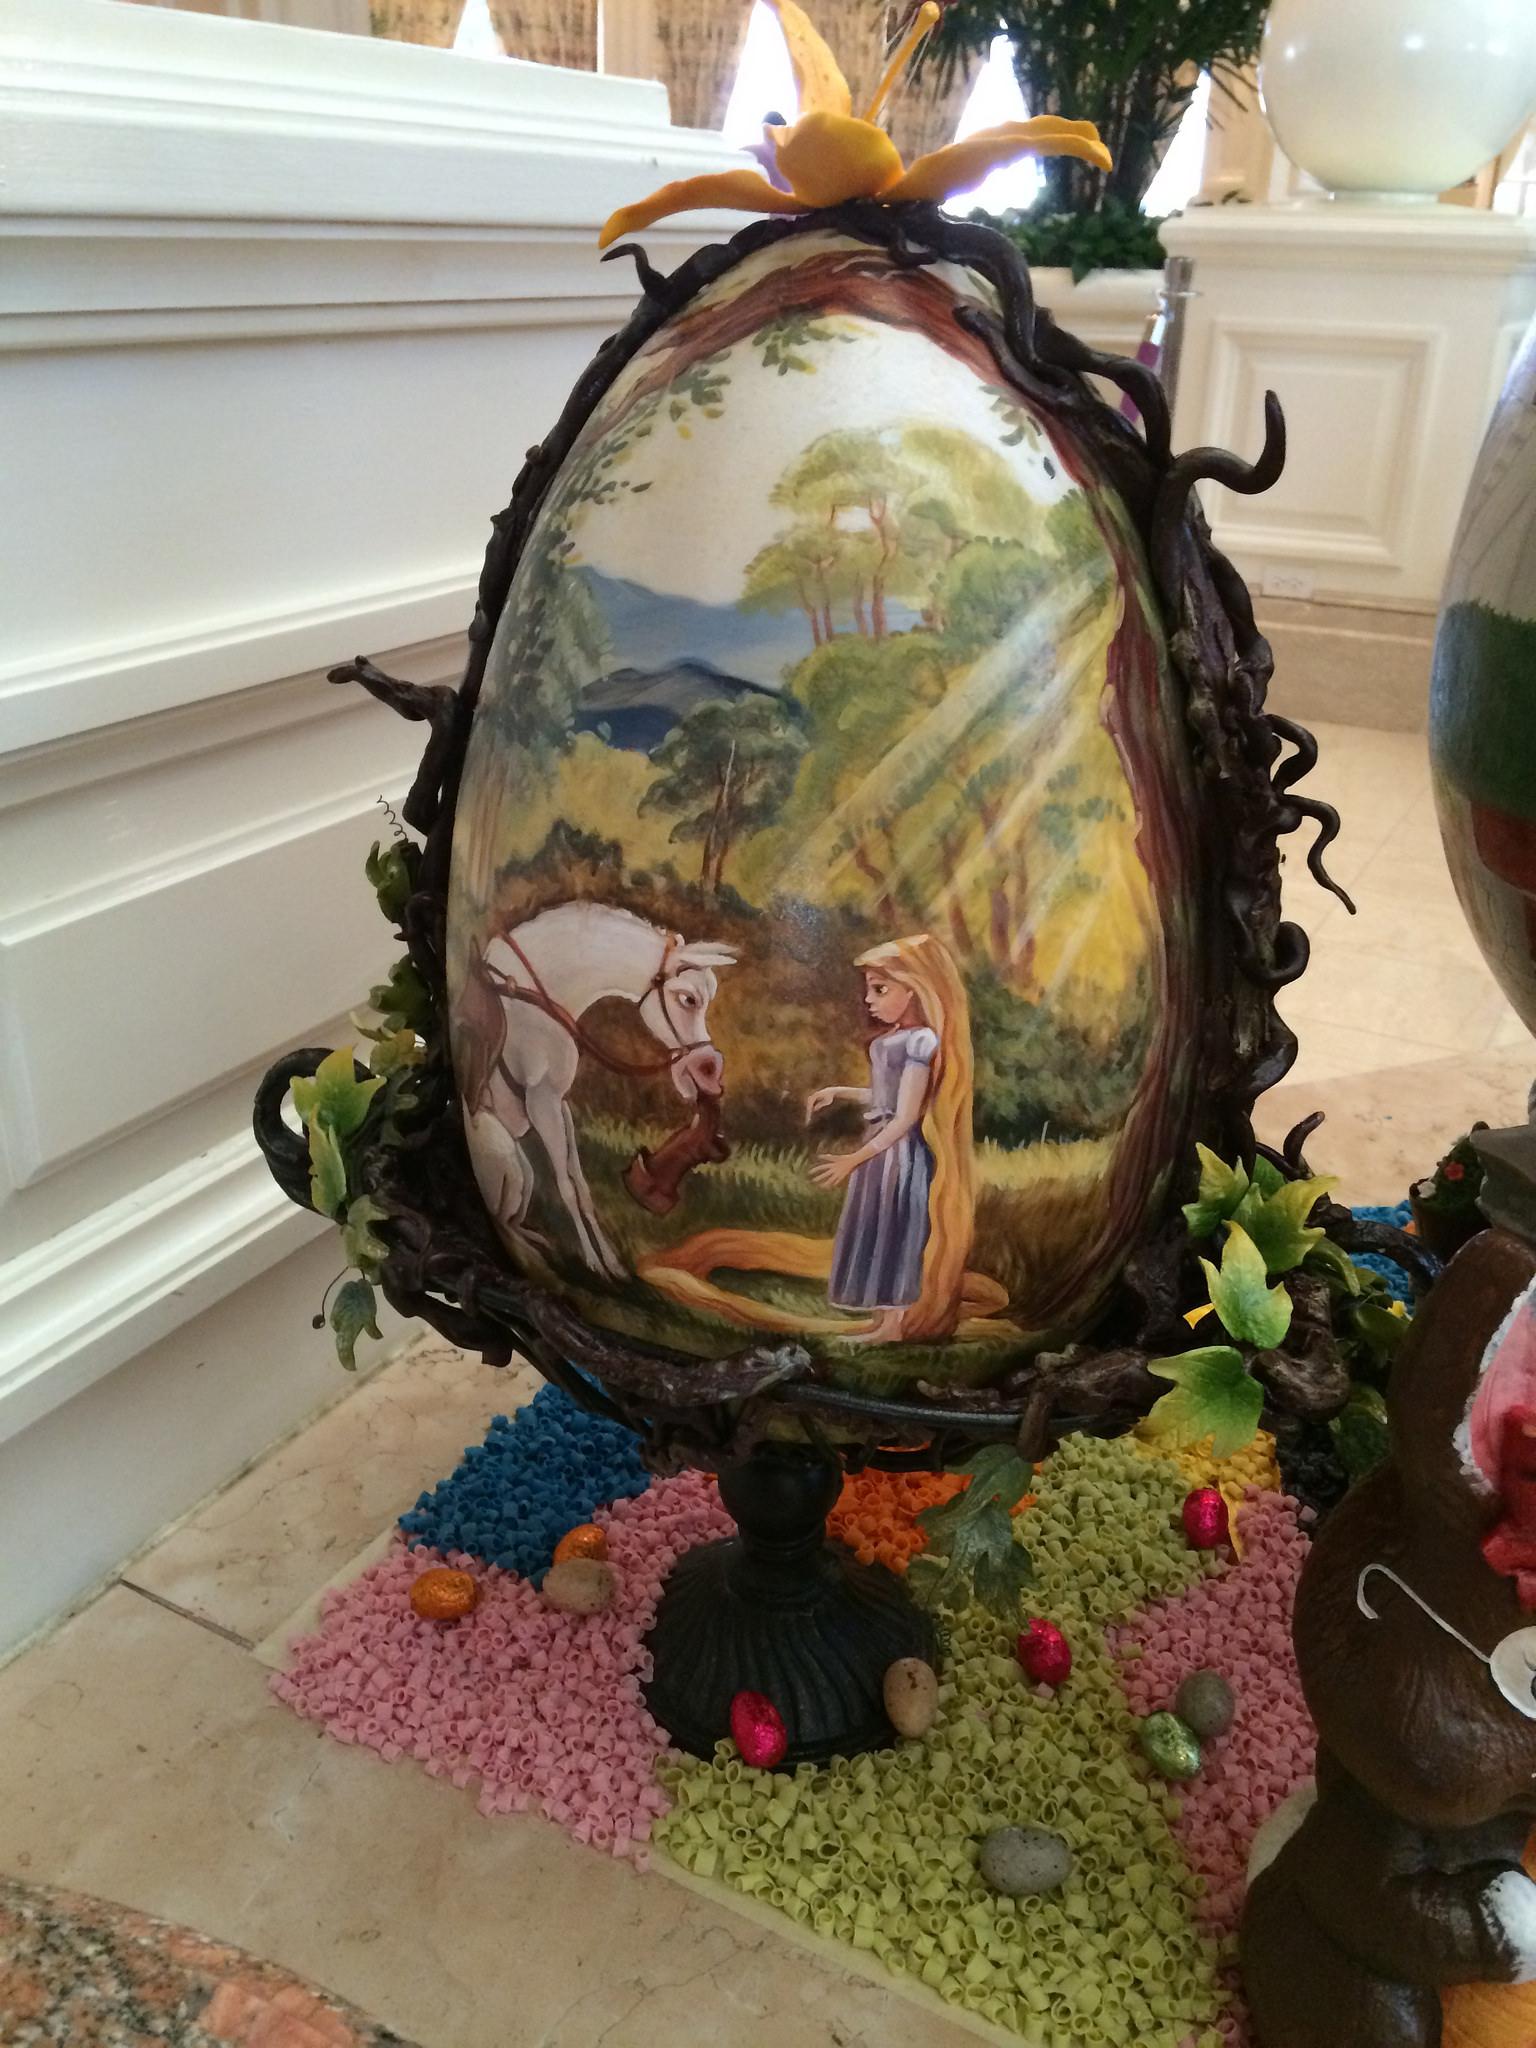 Disney's Grand Floridian Resort Easter Eggs Display 2015